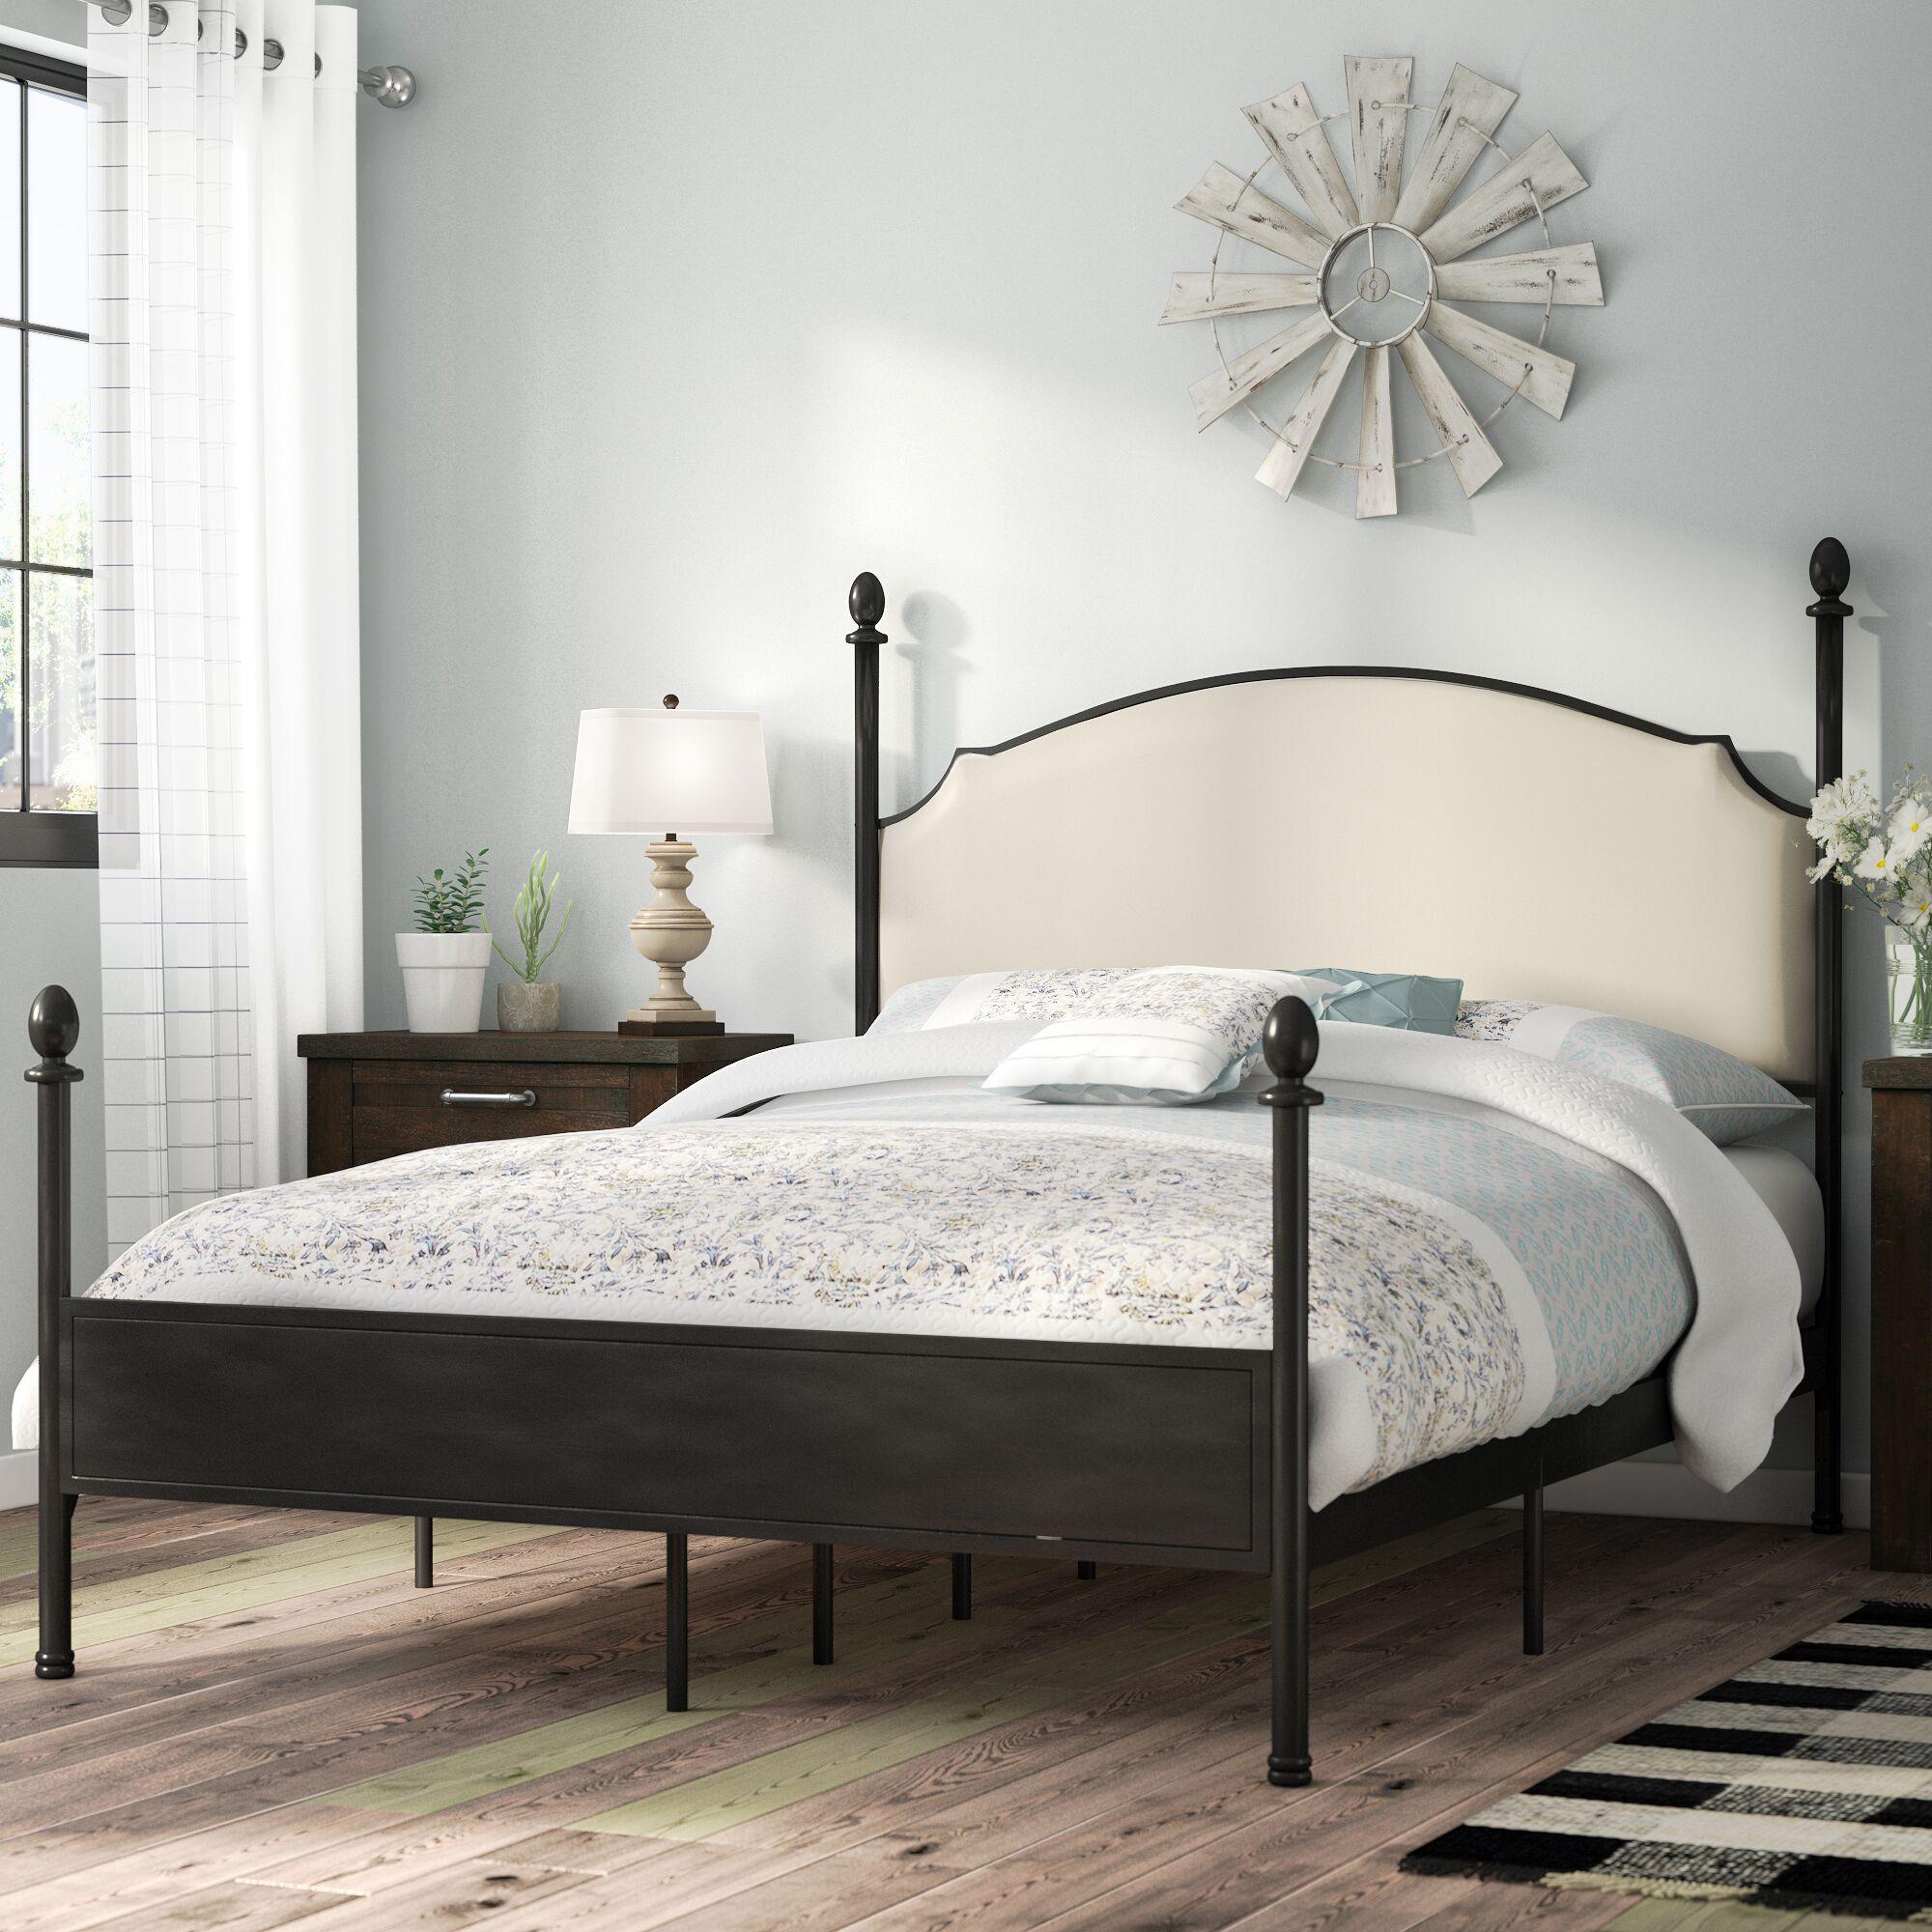 Granite Range Four Poster Bed Size: California King